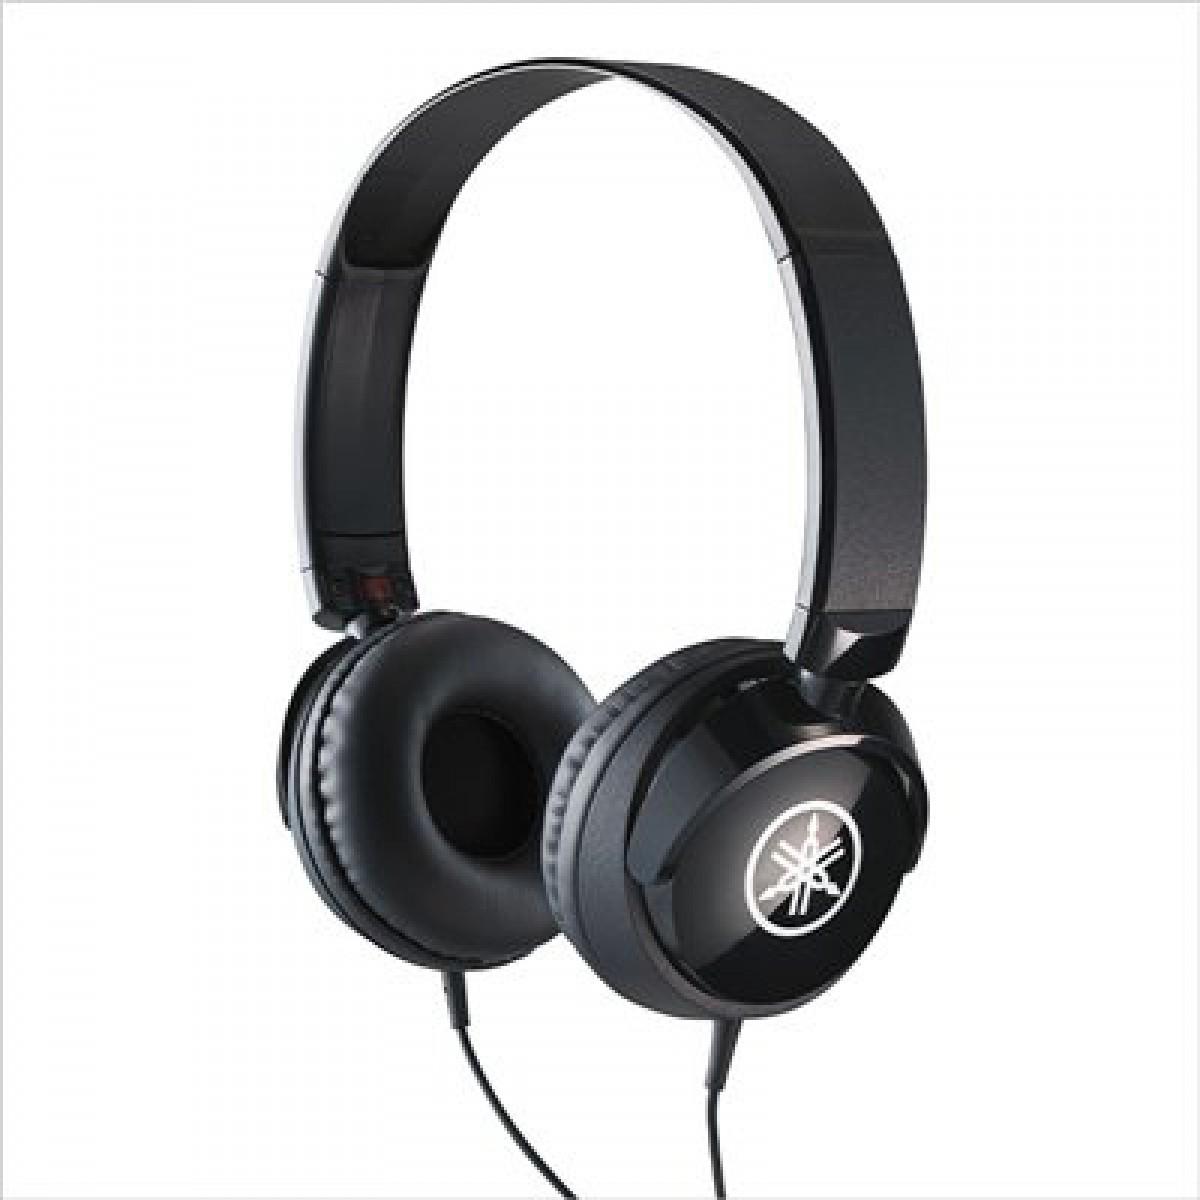 Kopfhörer inklusive